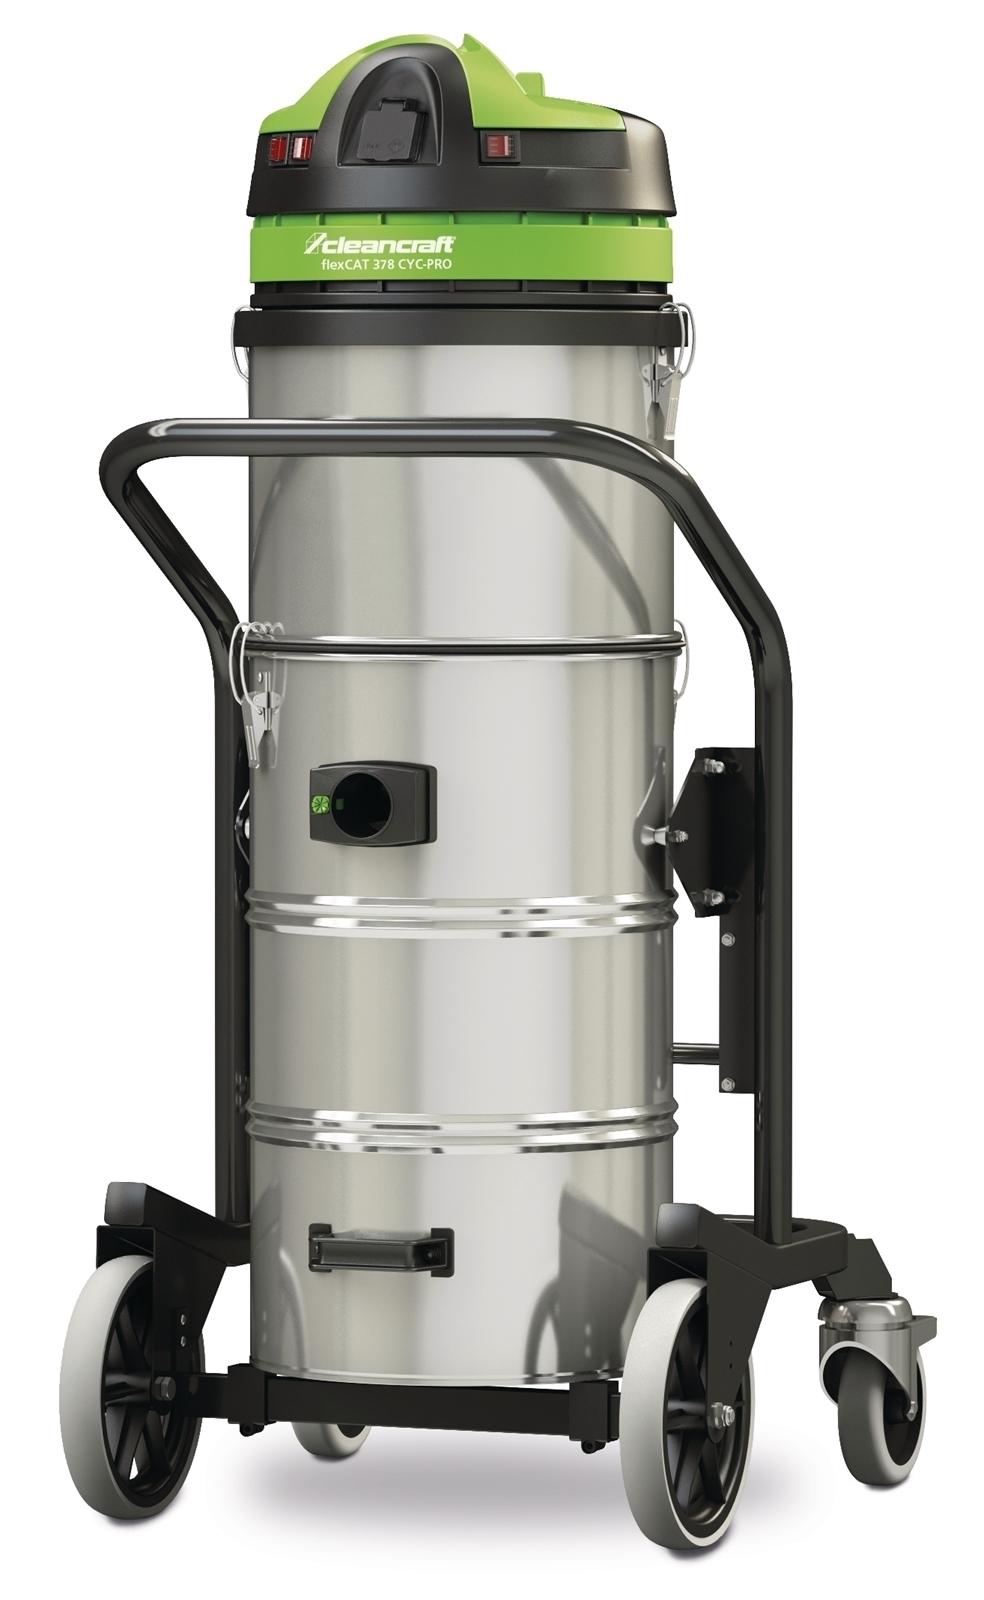 Cleancraft Bau-Zyklonsauger flexCAT 378 CYC-PRO jetzt